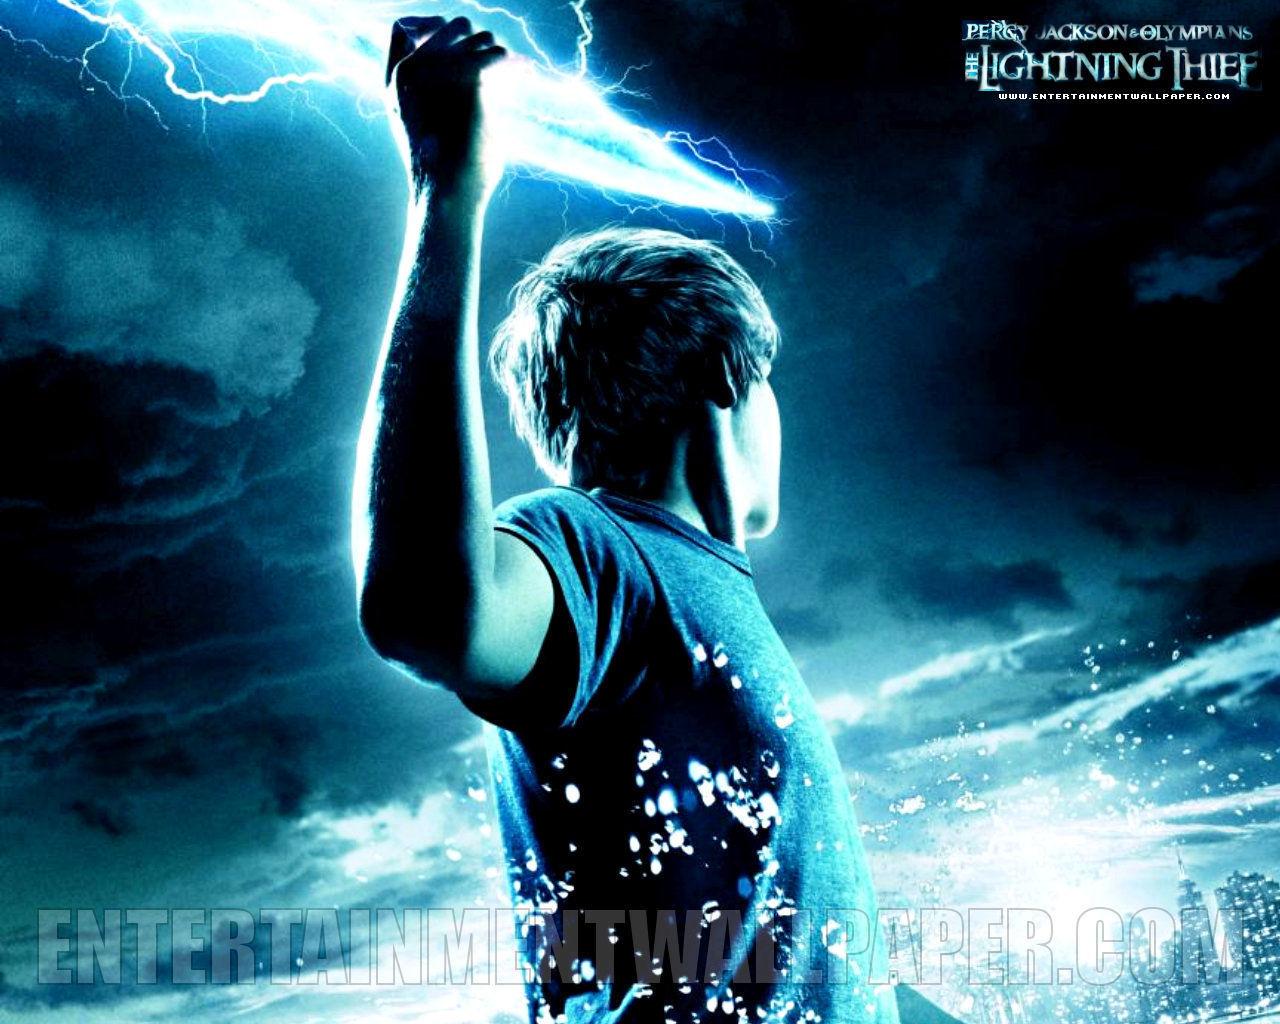 Logan Lerman as Percy Jackson - logan-lerman photo